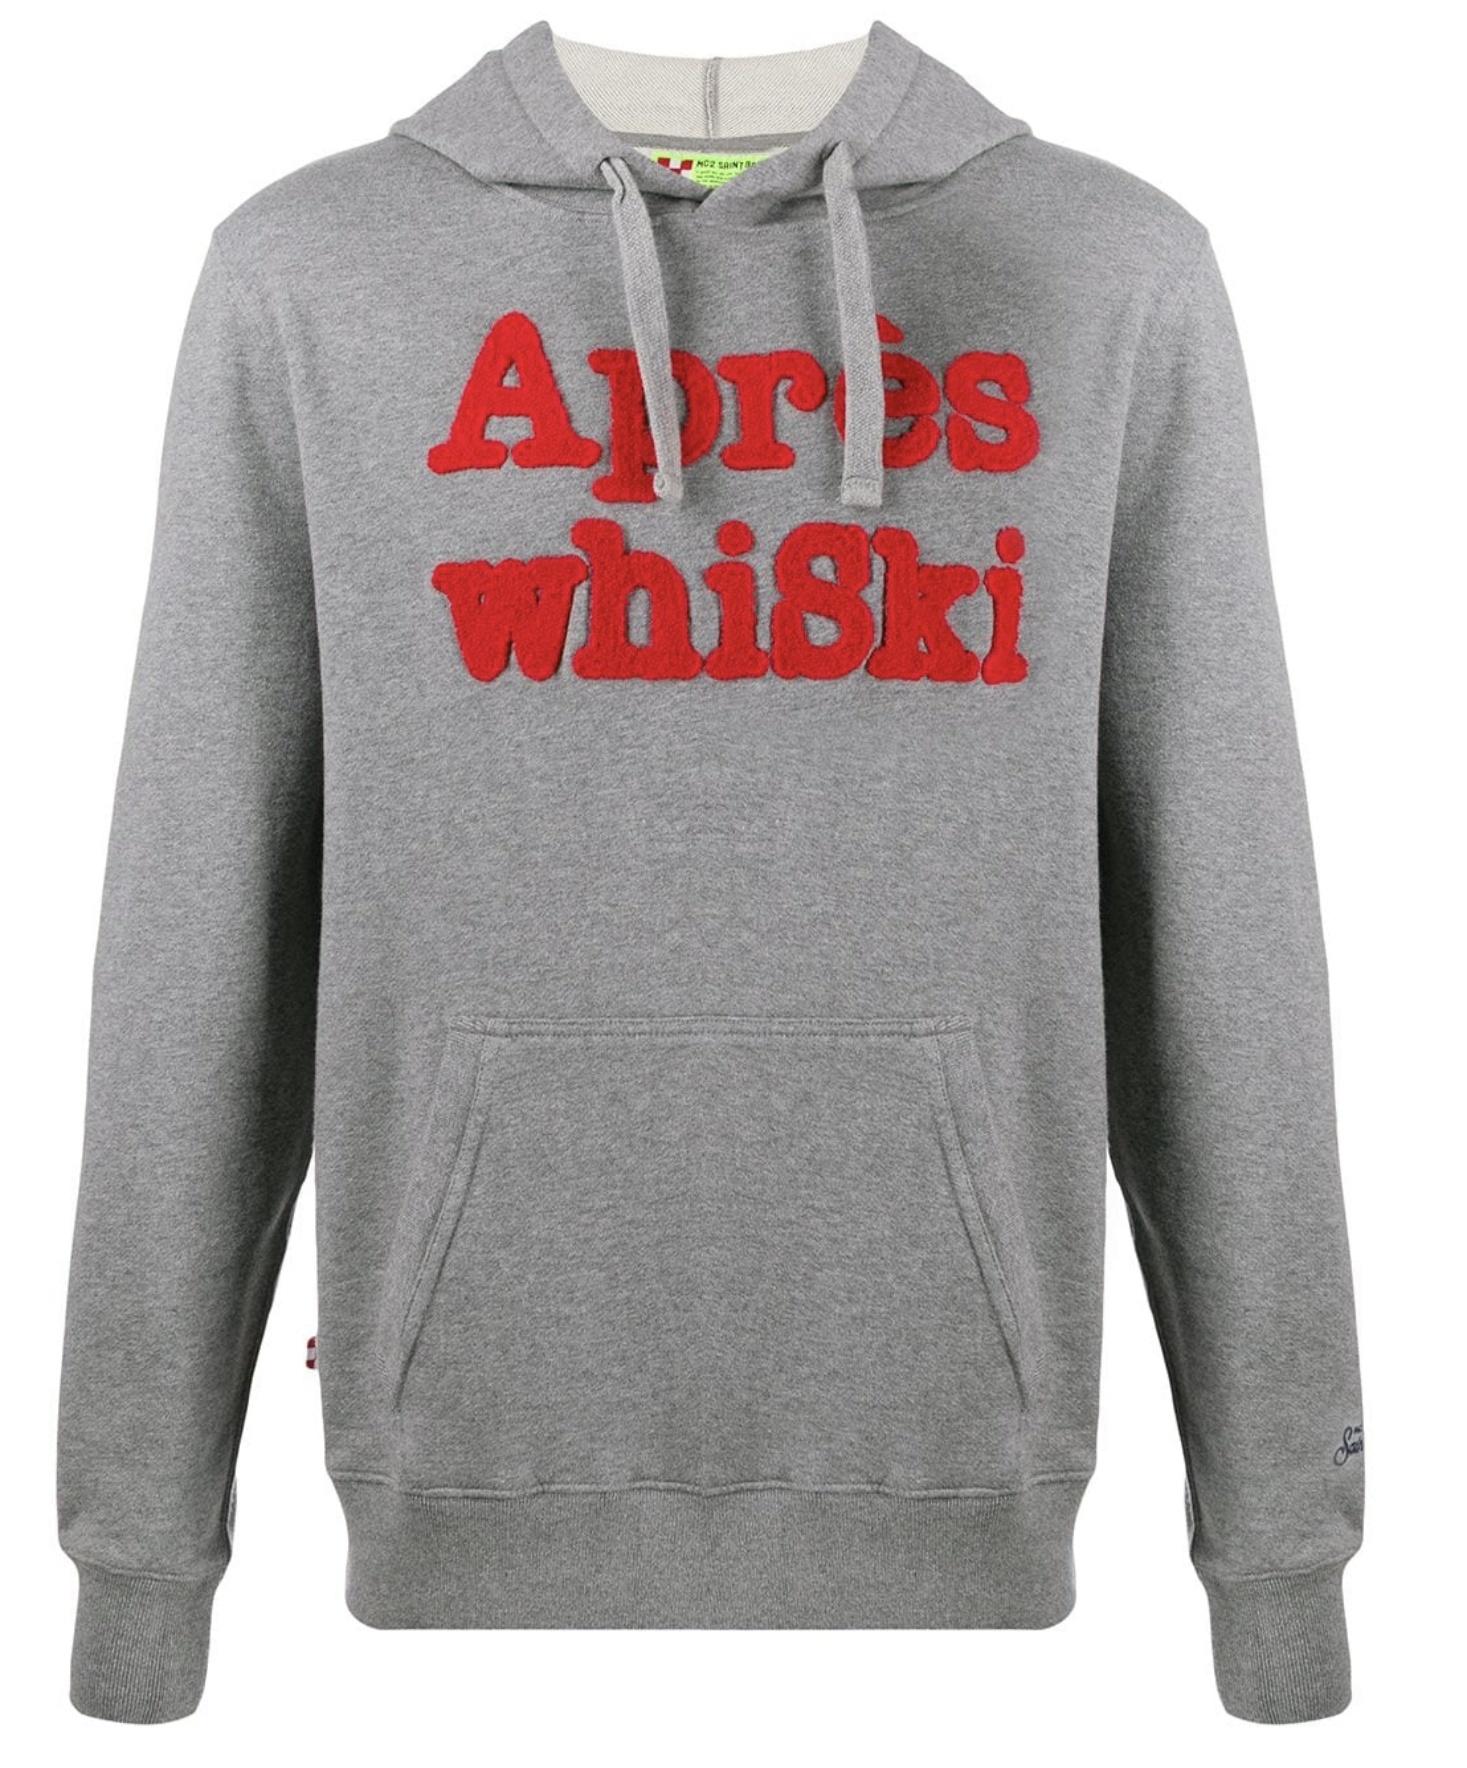 Apres Whiski Hoodie-1